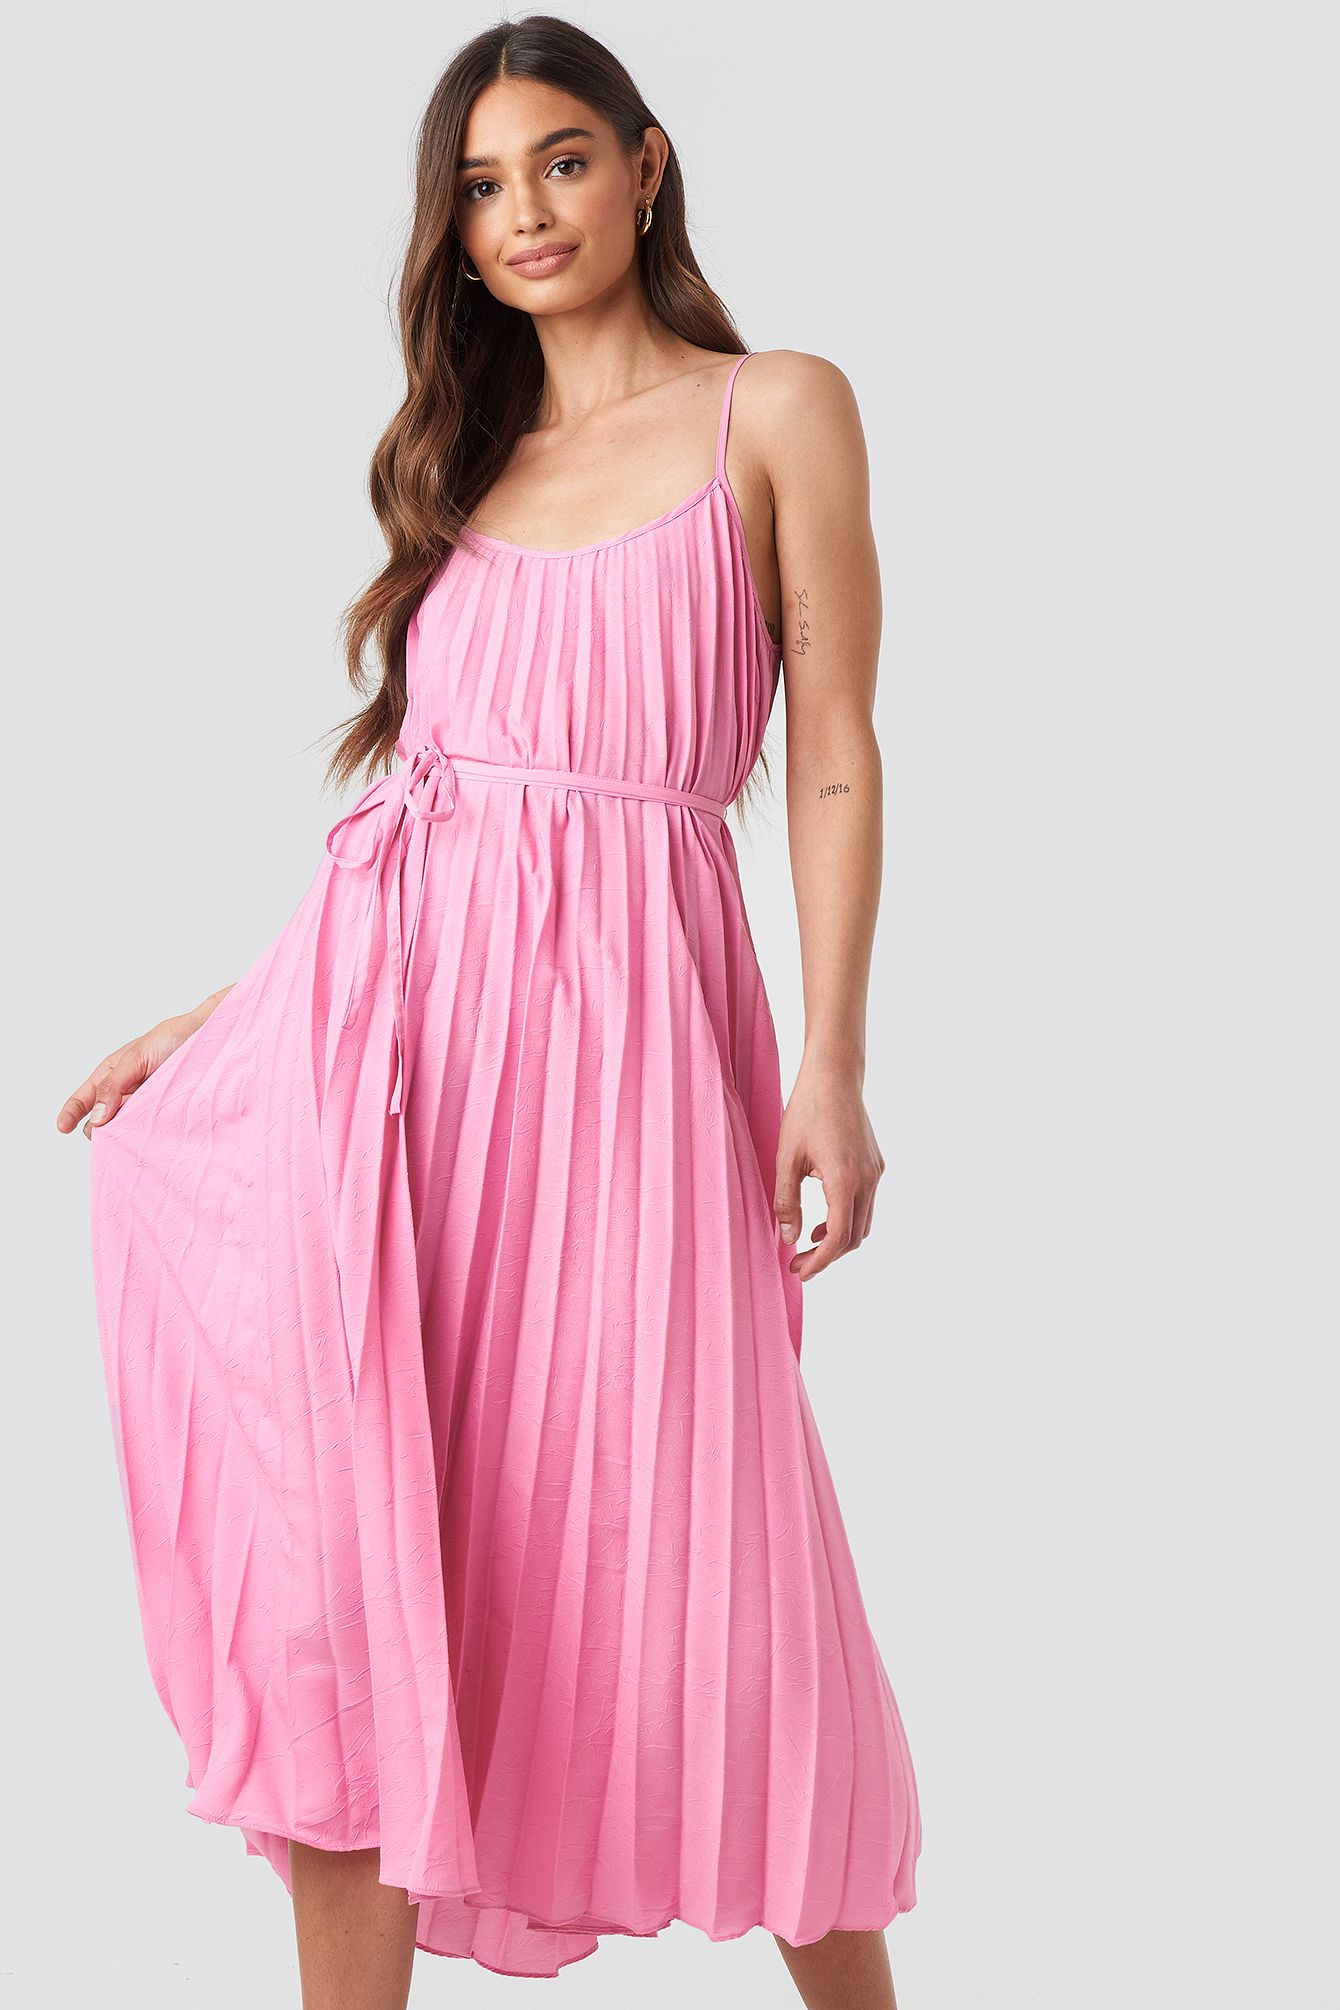 plisado dress rosa in 2020 | plissierte kleider, kleidung